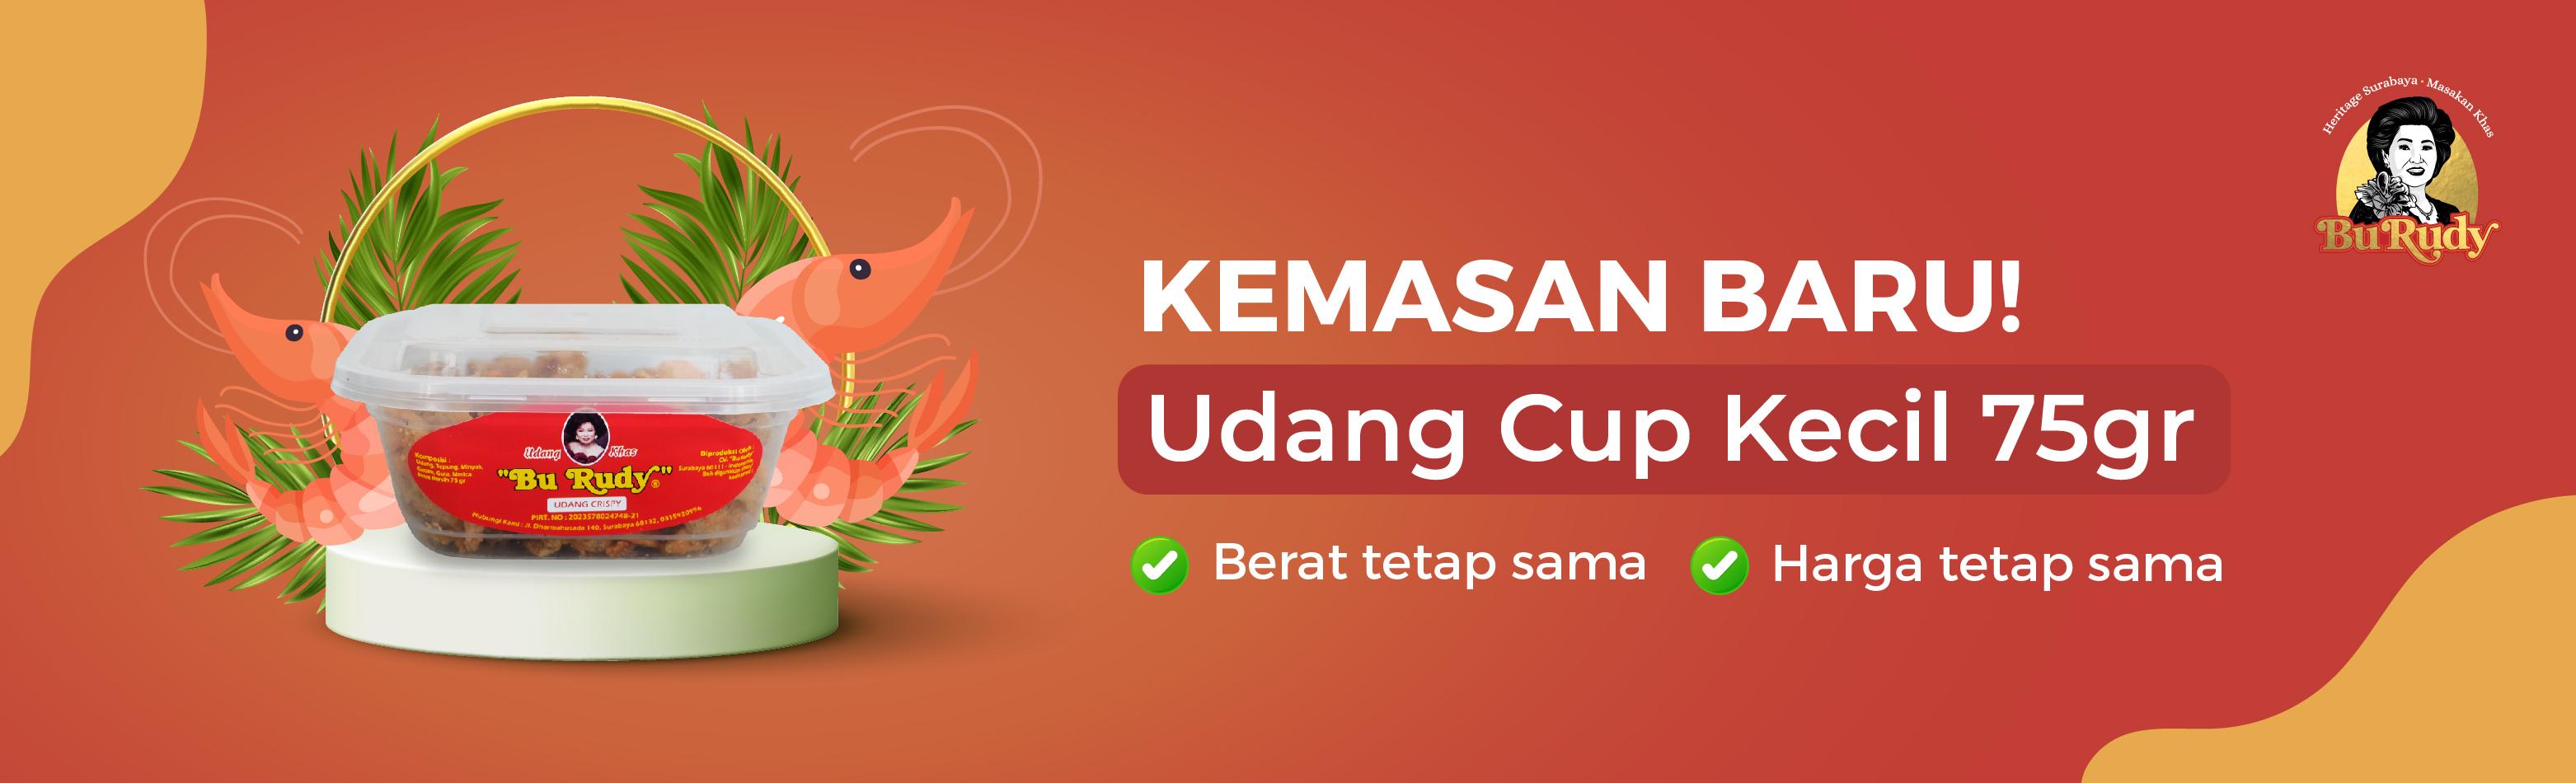 banner burudy website_udang cup.jpg